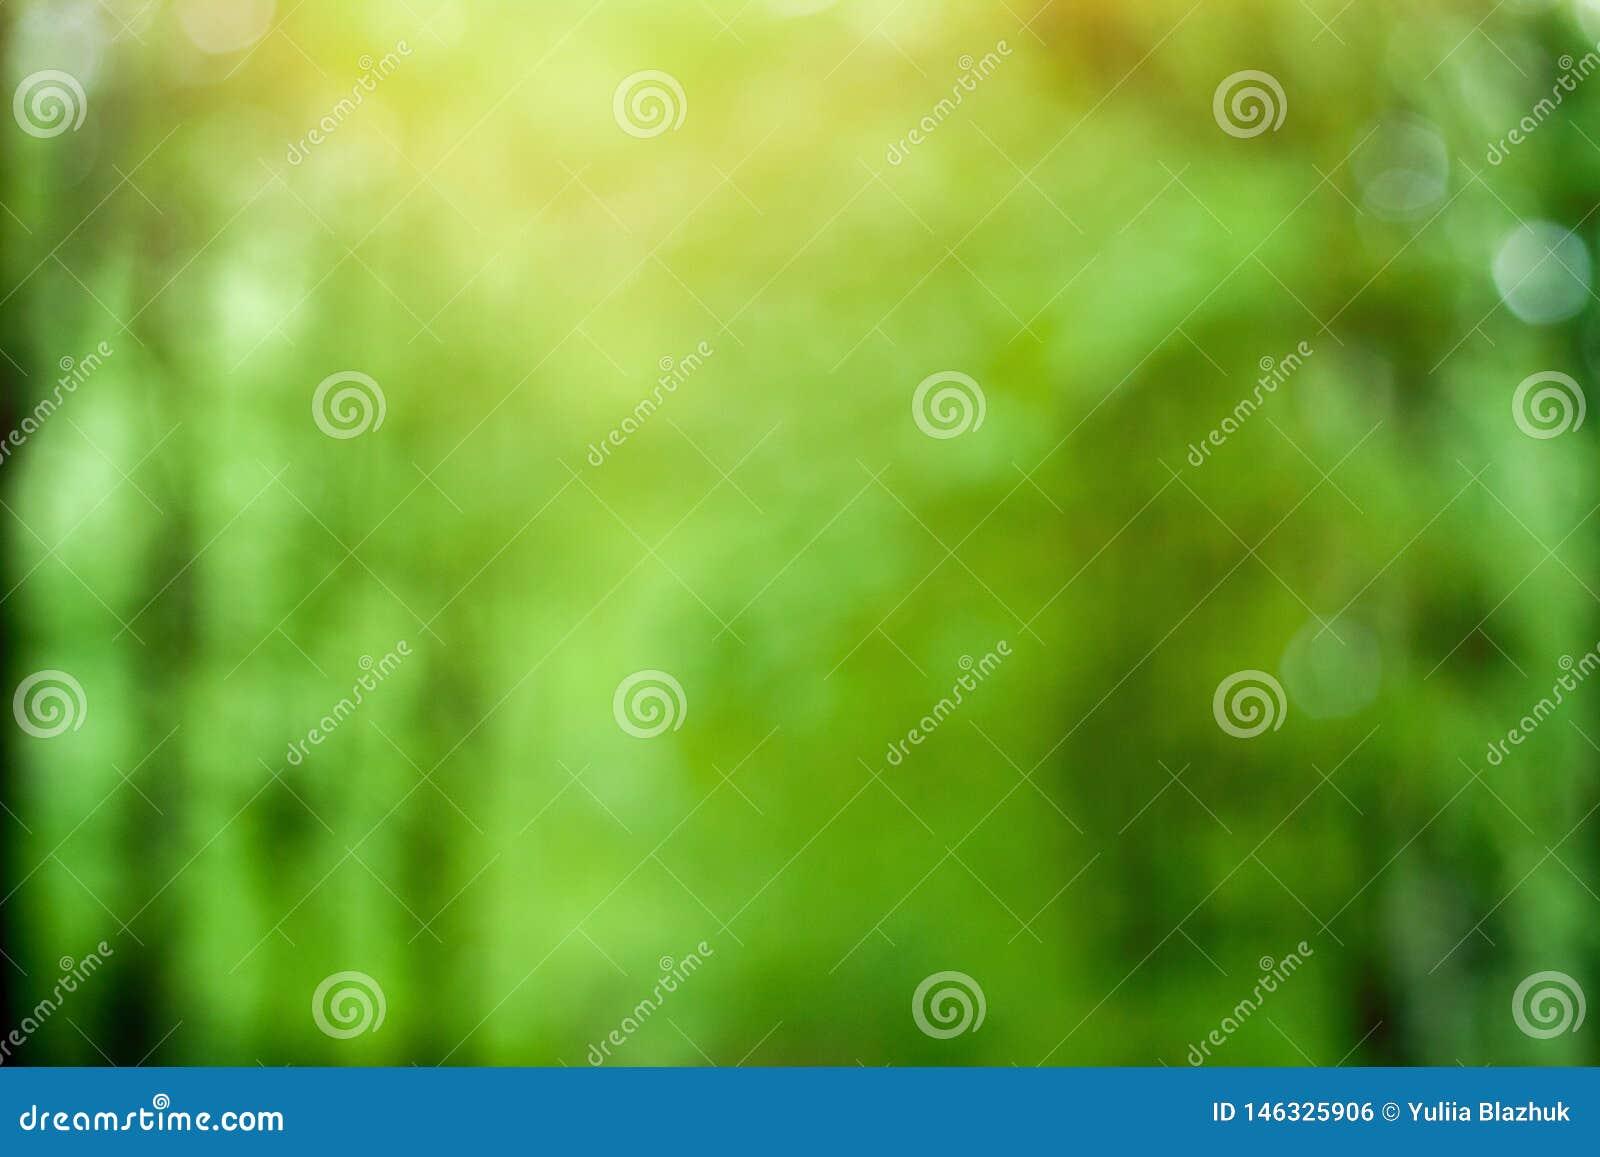 Запачканная зеленая солнечная предпосылка леса